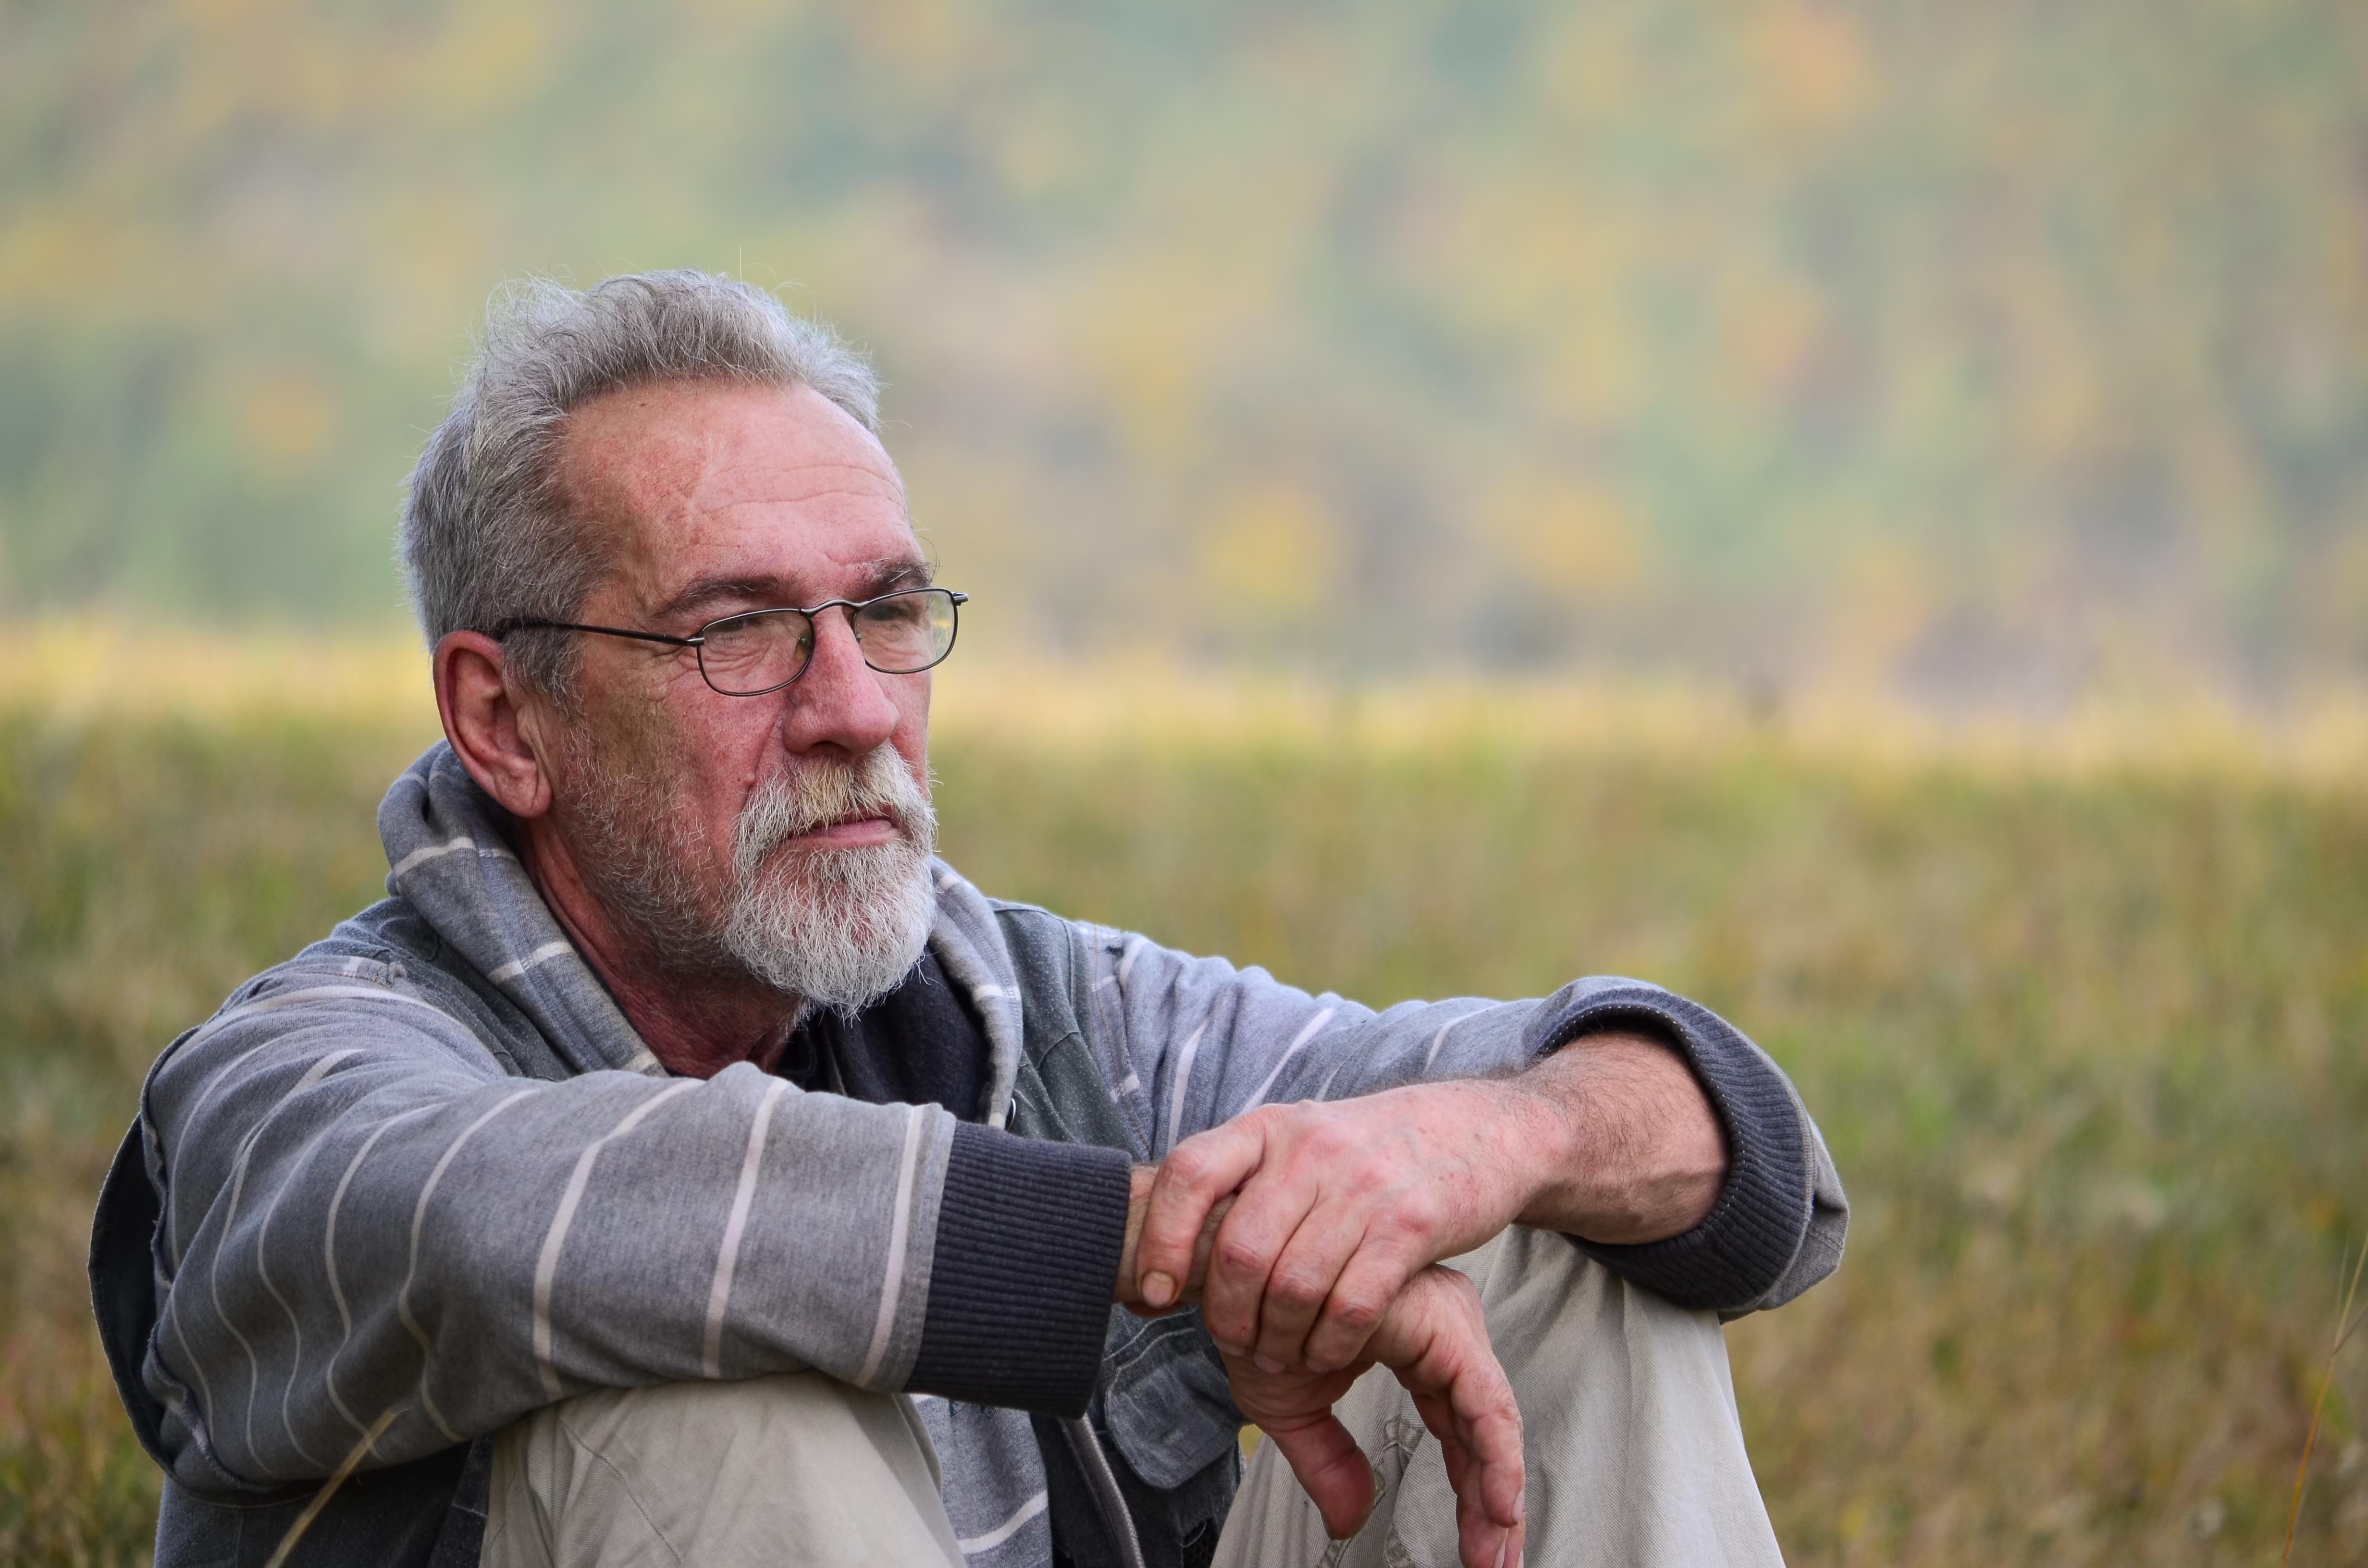 anxiety disorder philadelphia therapist